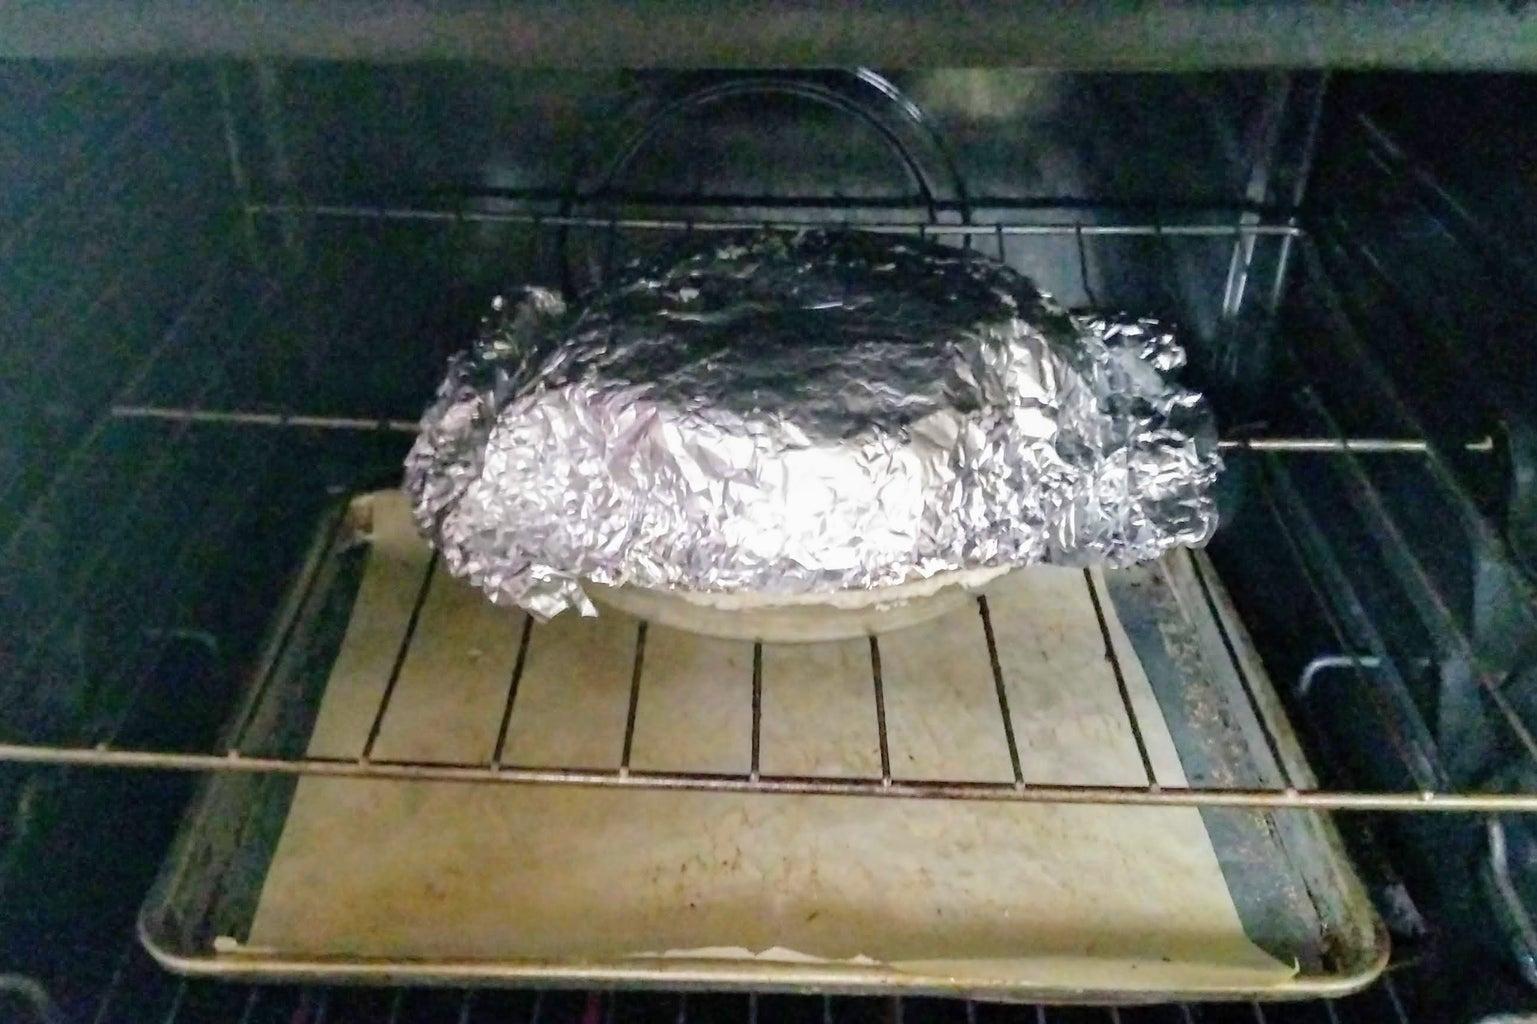 The Bake